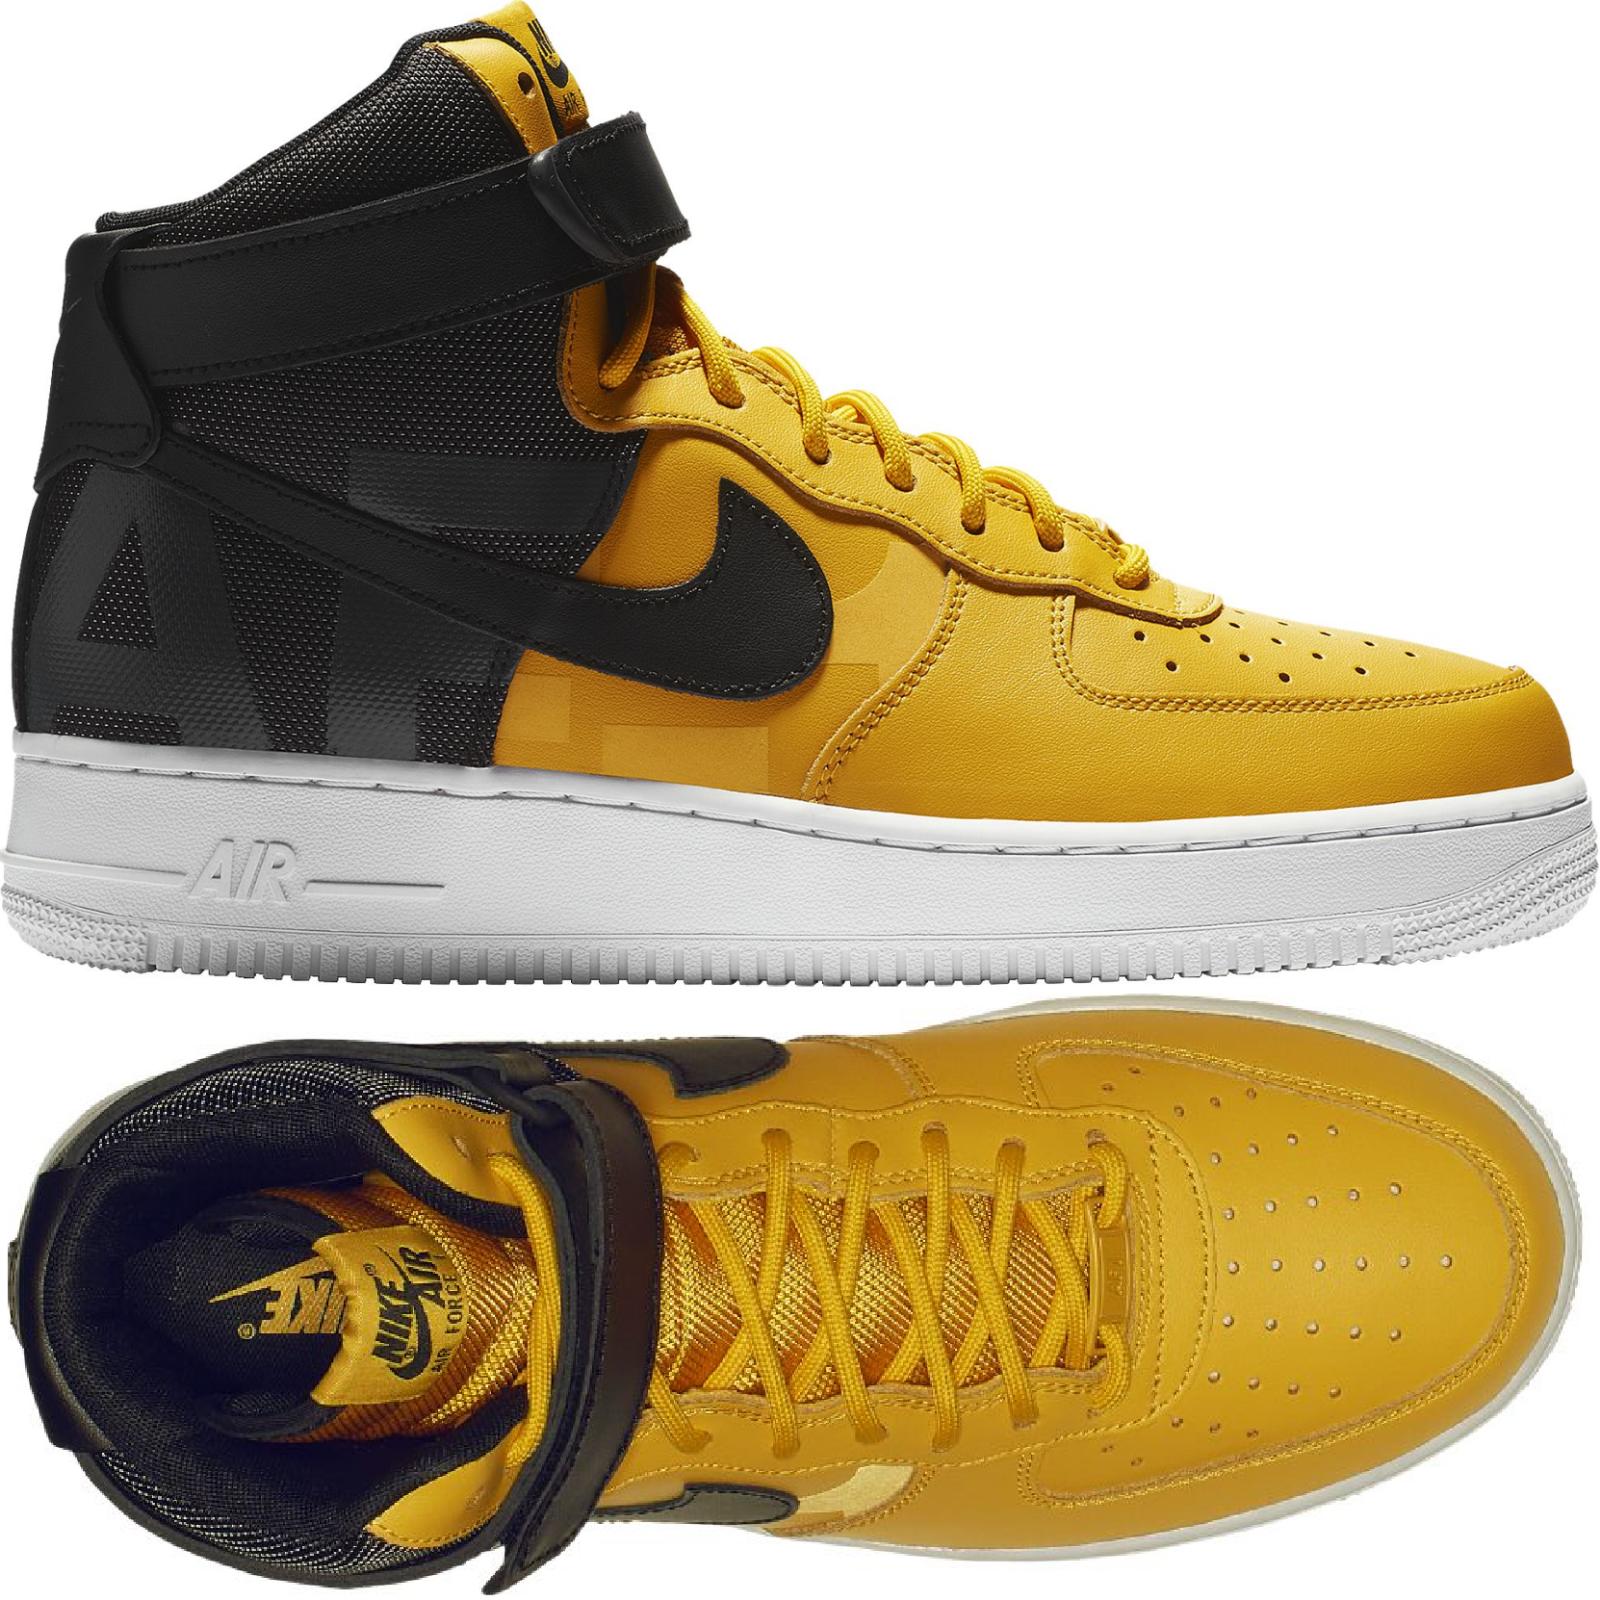 bouclier de chaussure air force 1